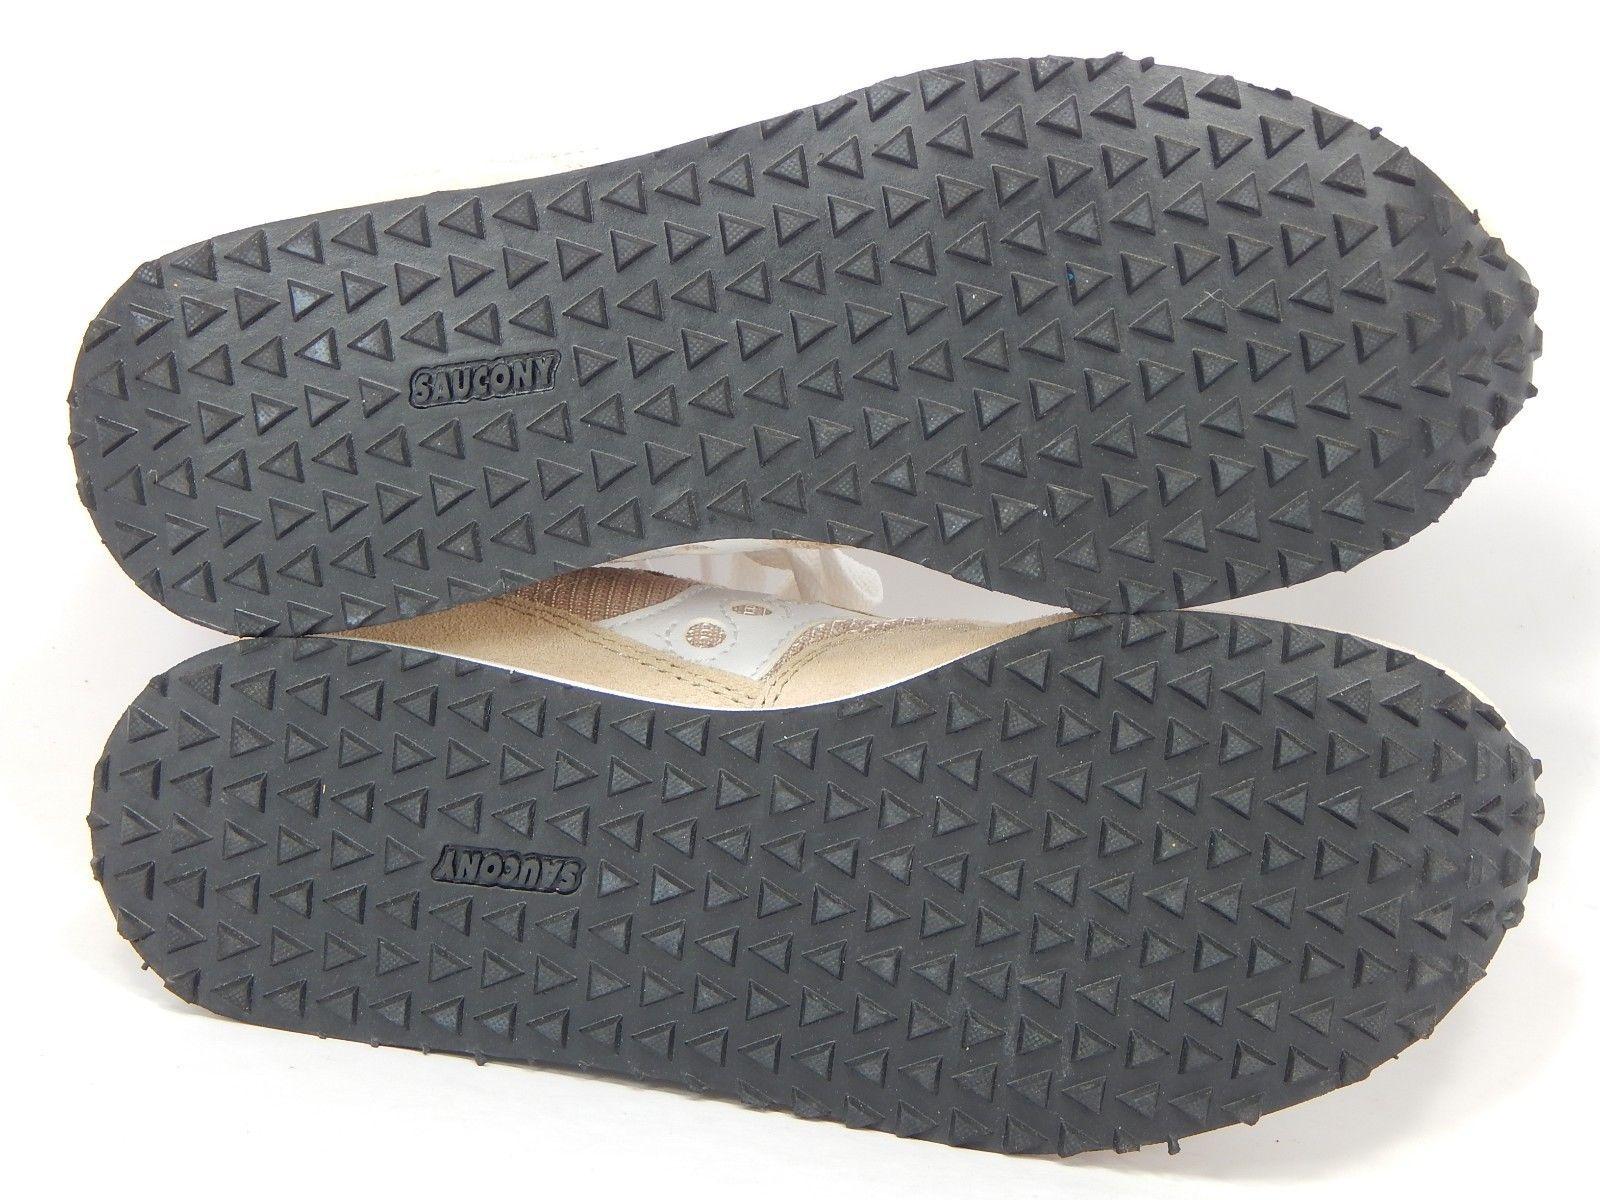 Saucony DXN Trainer Original S60124-42 Women's Running Shoes Size 7 M (B) EU 38